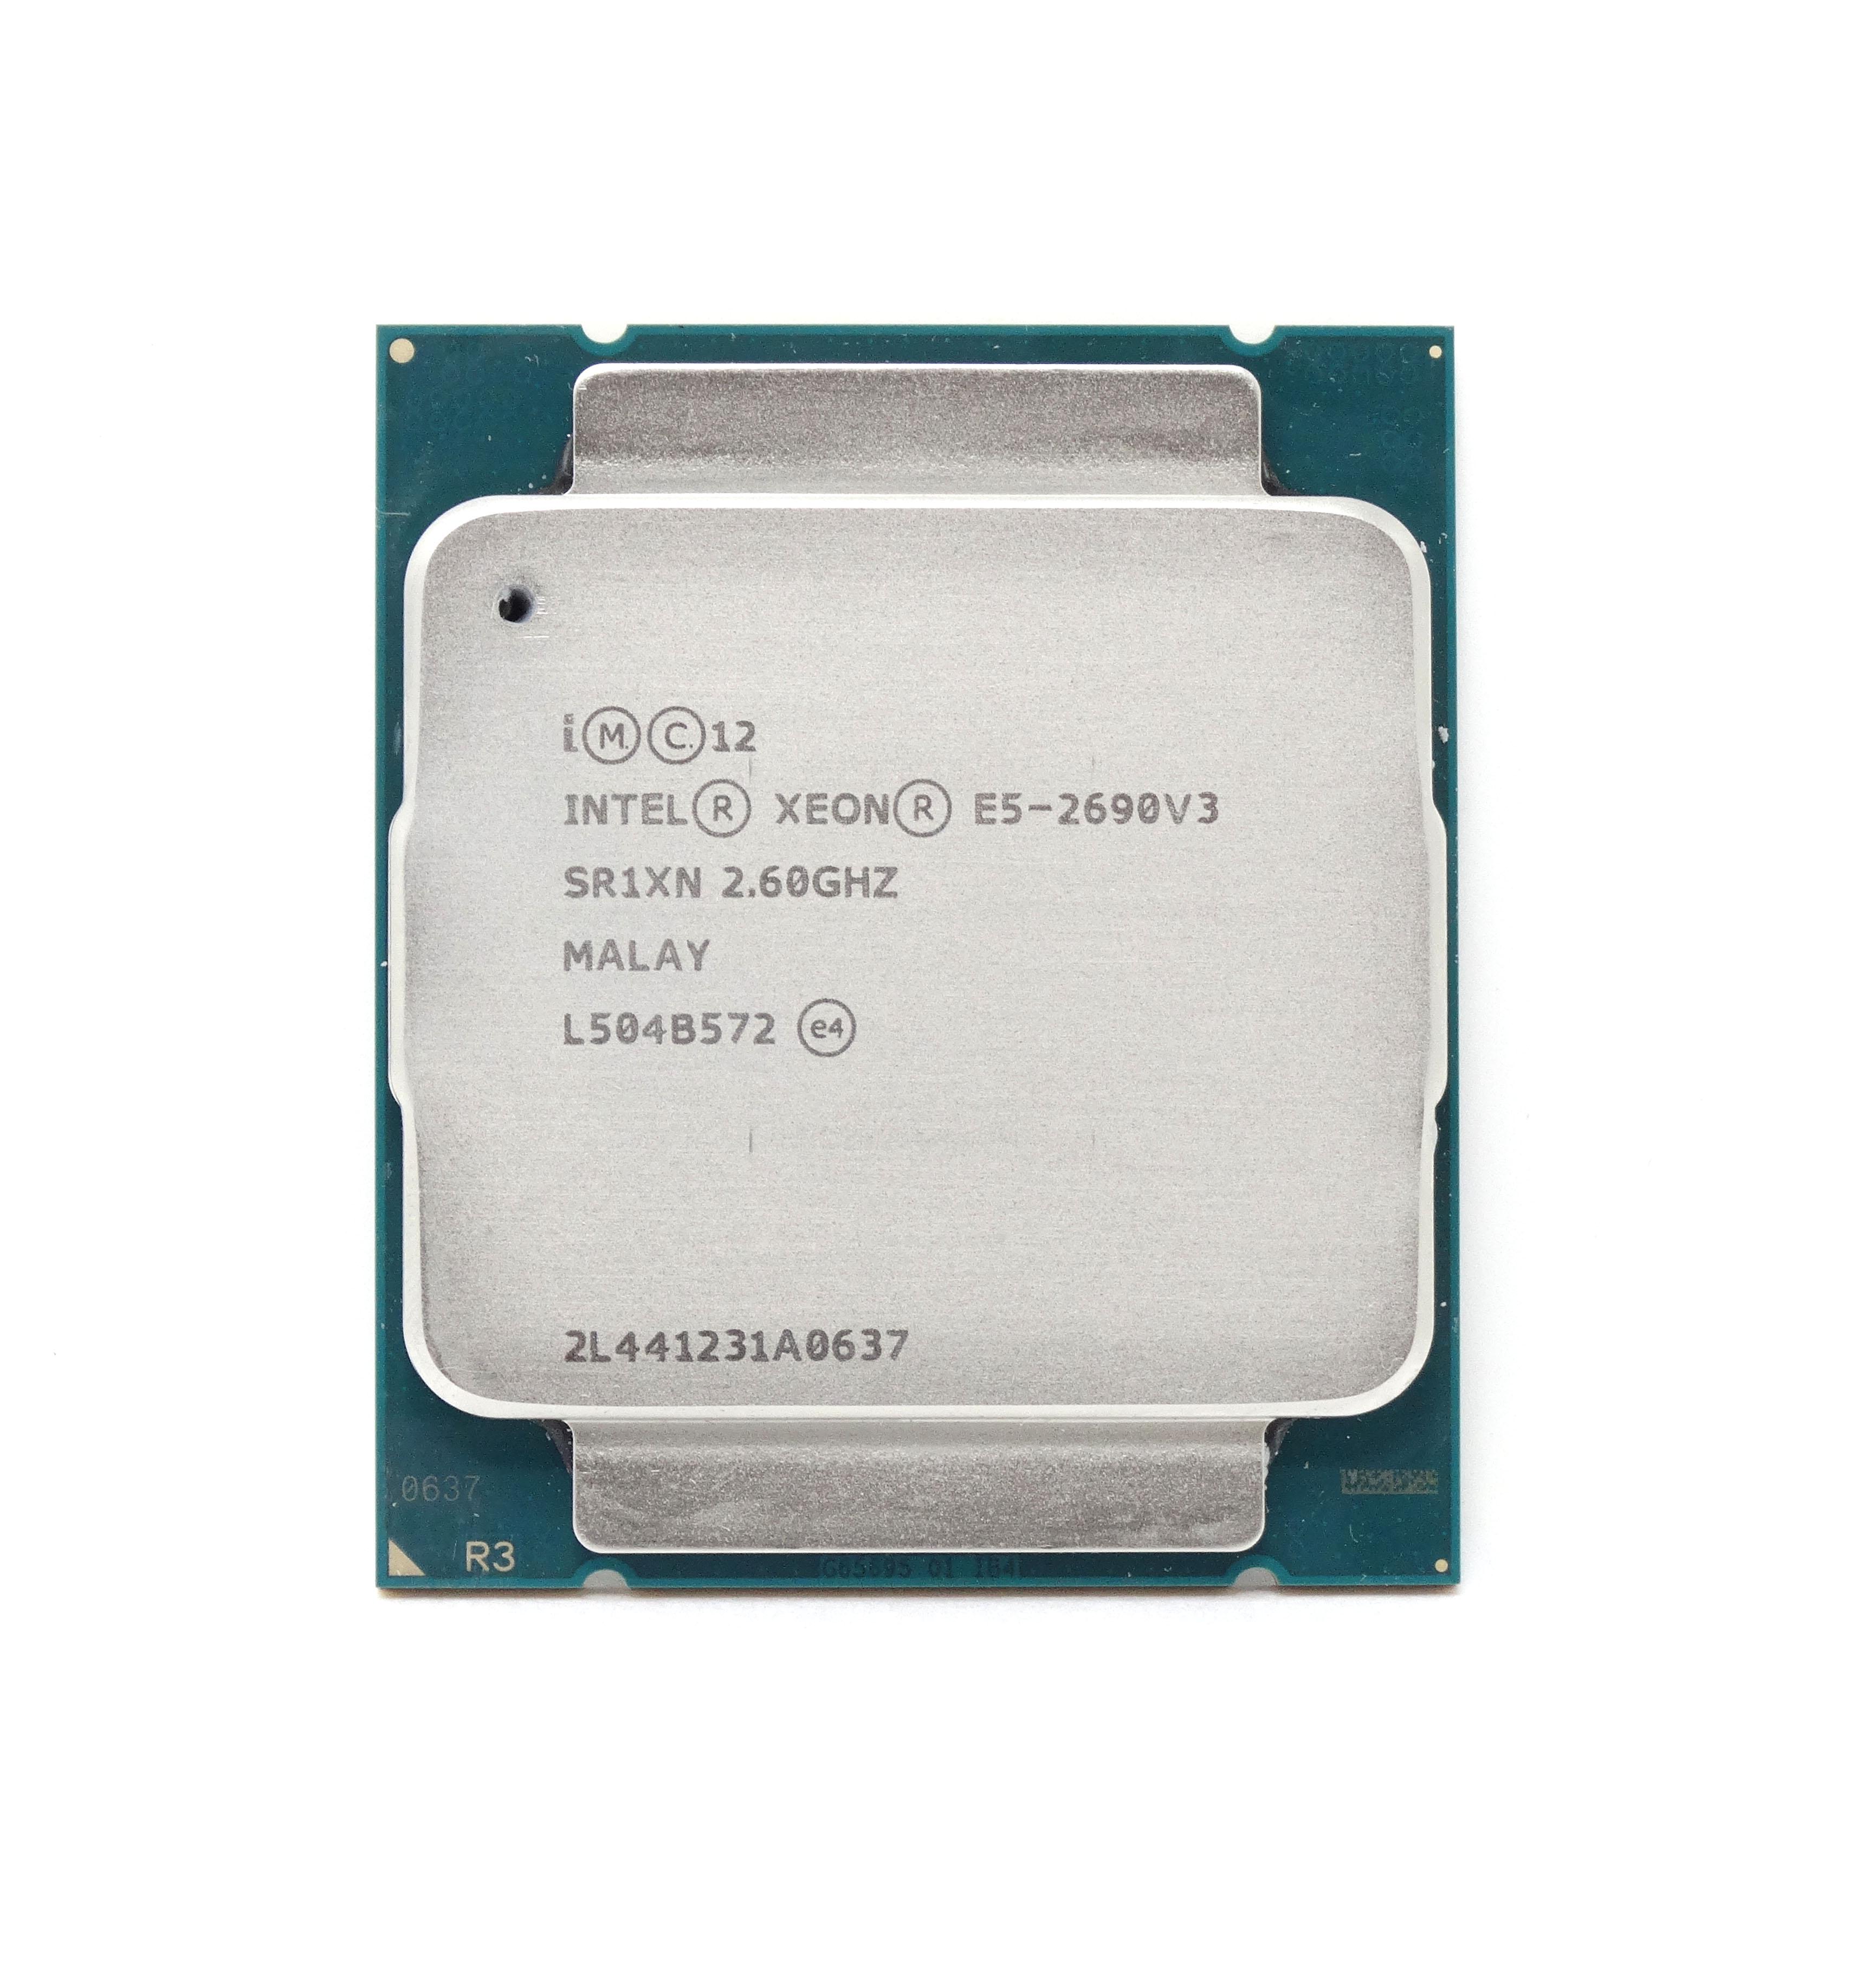 Intel Xeon E5-2690V3 2 6GHz Twelve Core (CM8064401439416) Processor